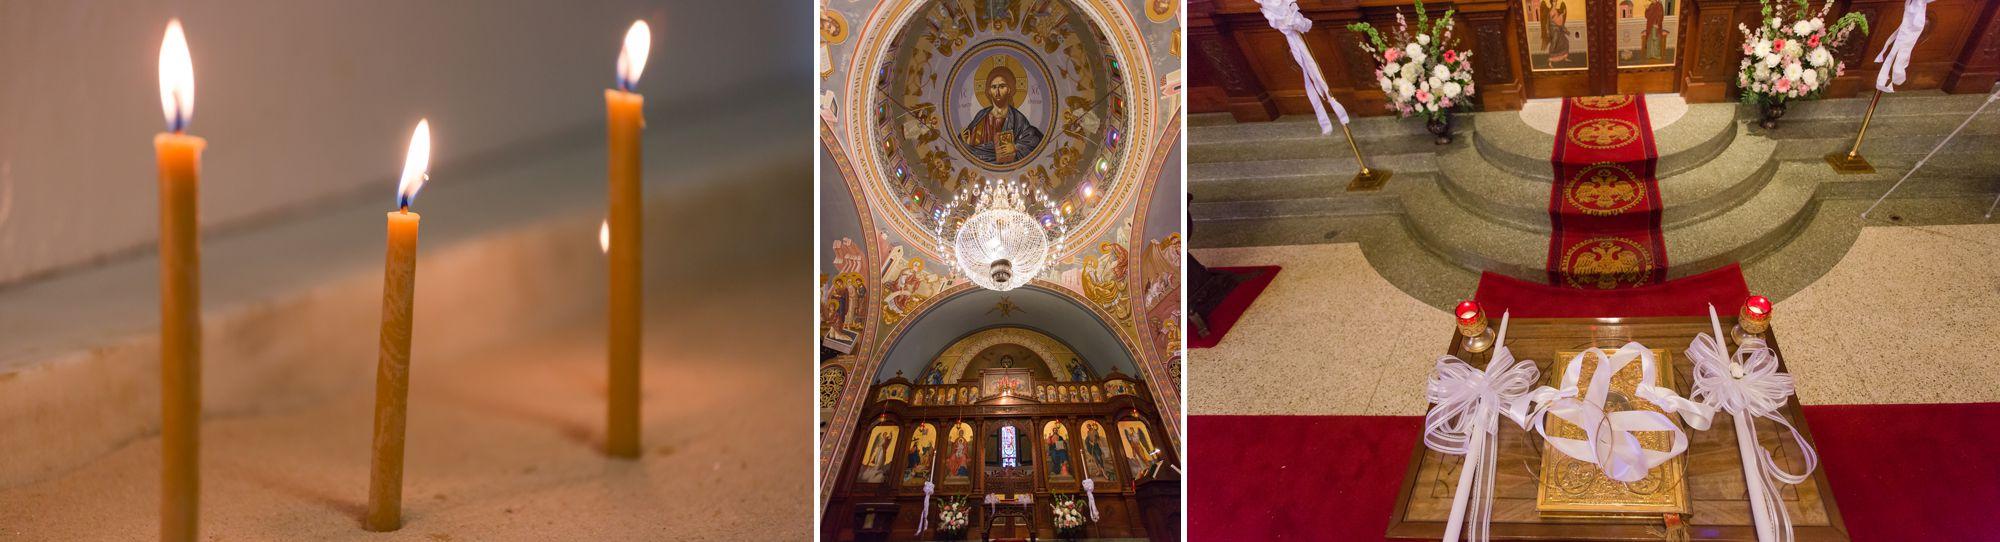 uptown-charlotte-orthodox-greek-wedding 50